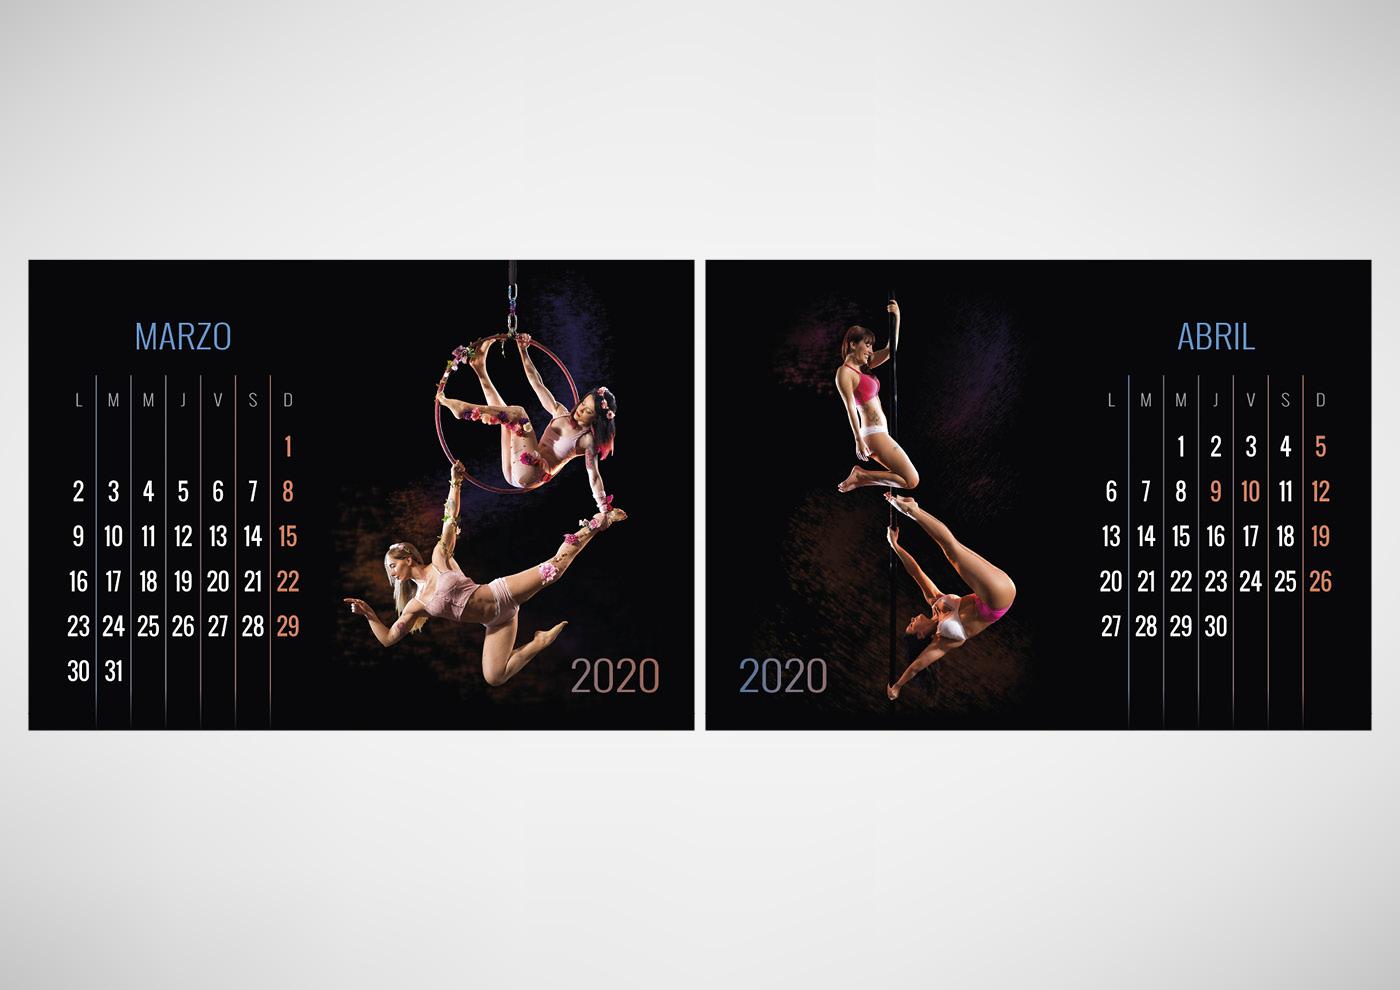 Vaya Huellas - Calendario 2020 - Ivan Diez